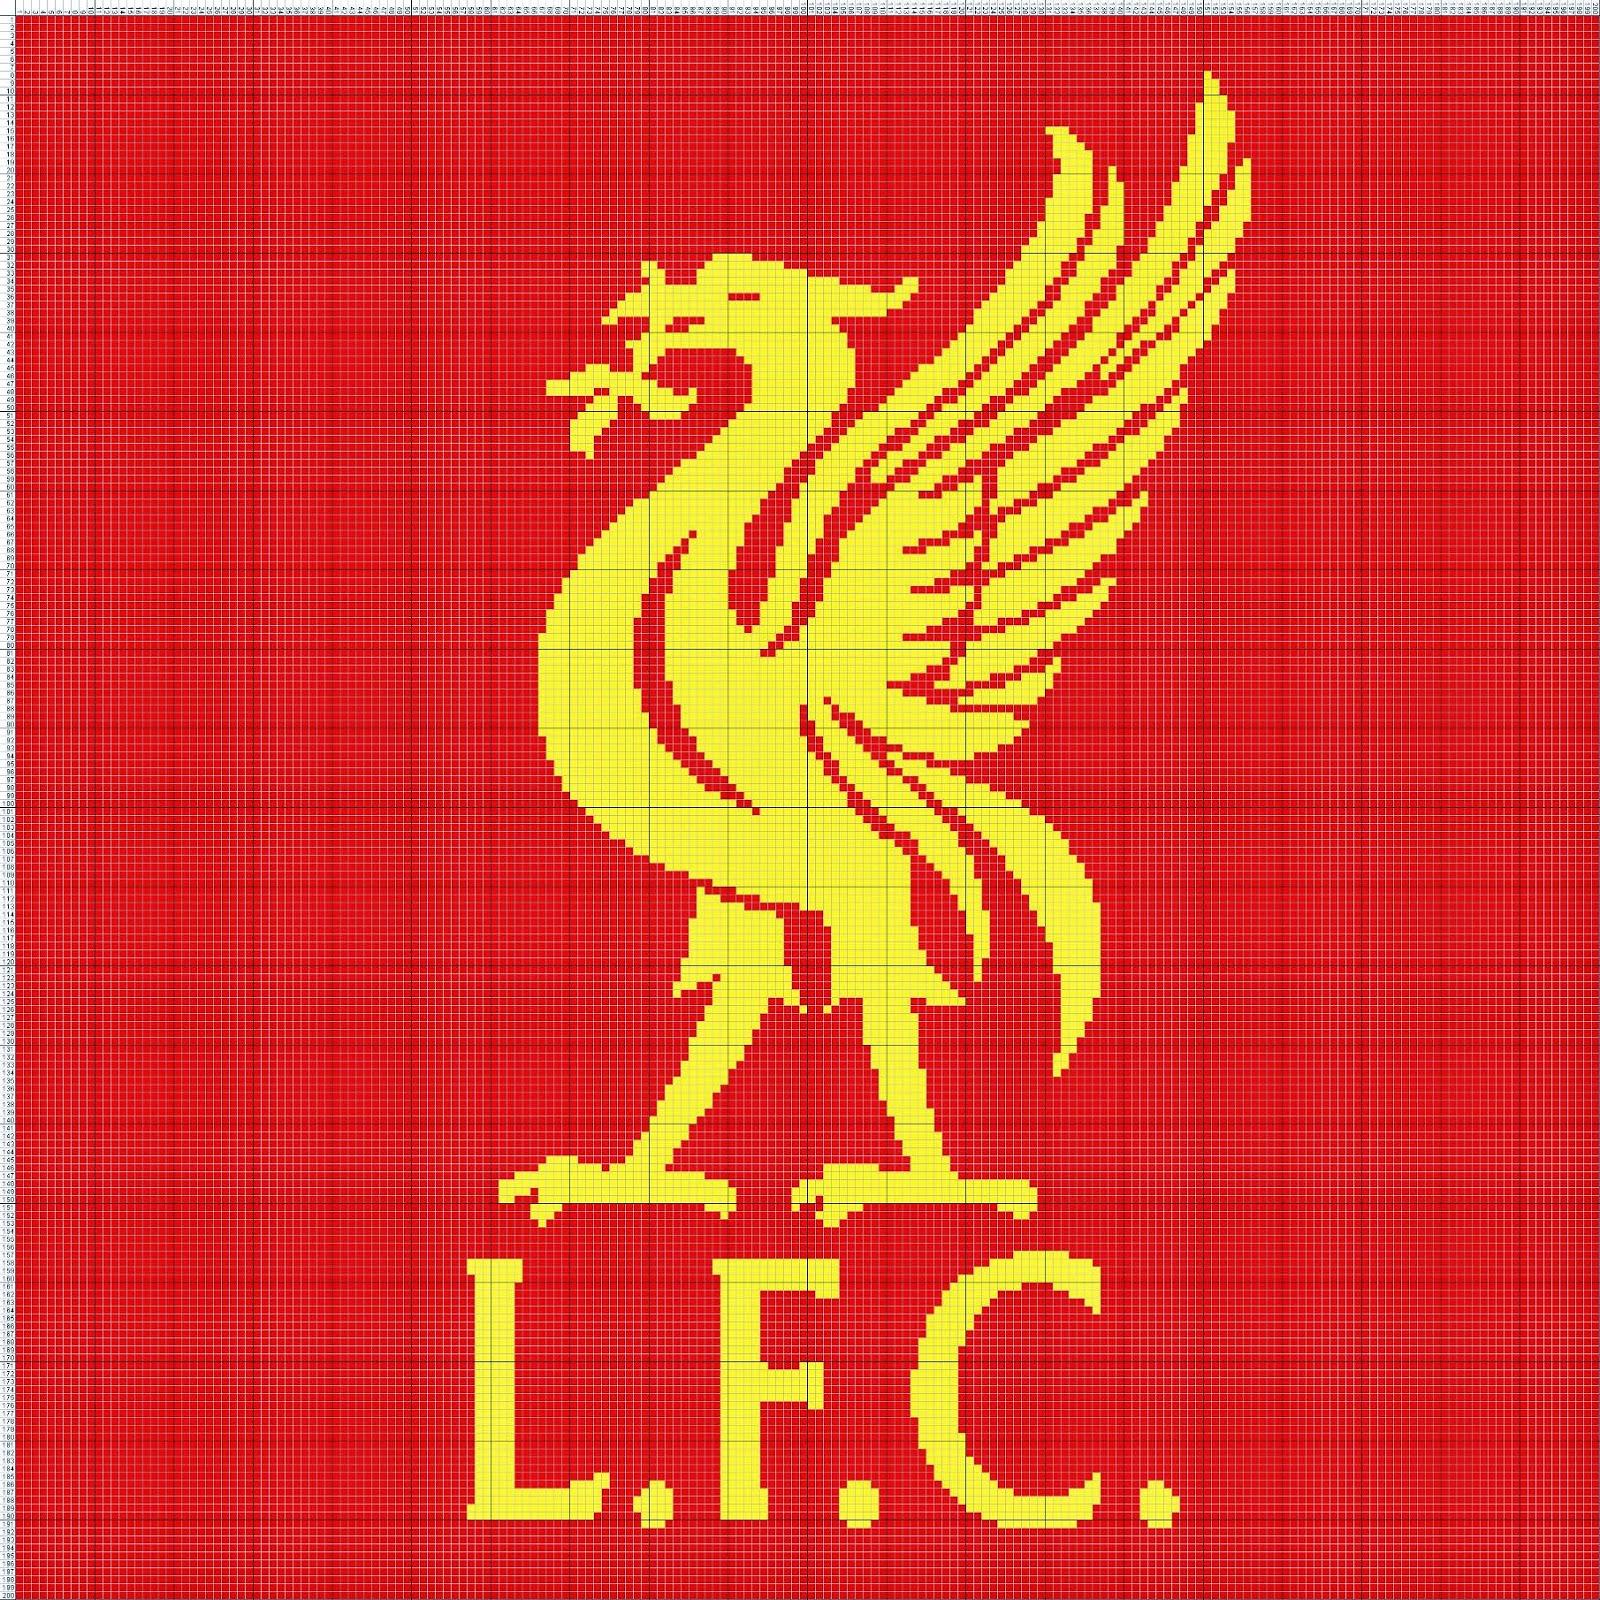 Gambar Pola Kristik Sederhana Logo Klub Sepakbola Liverpool FC - Inggris